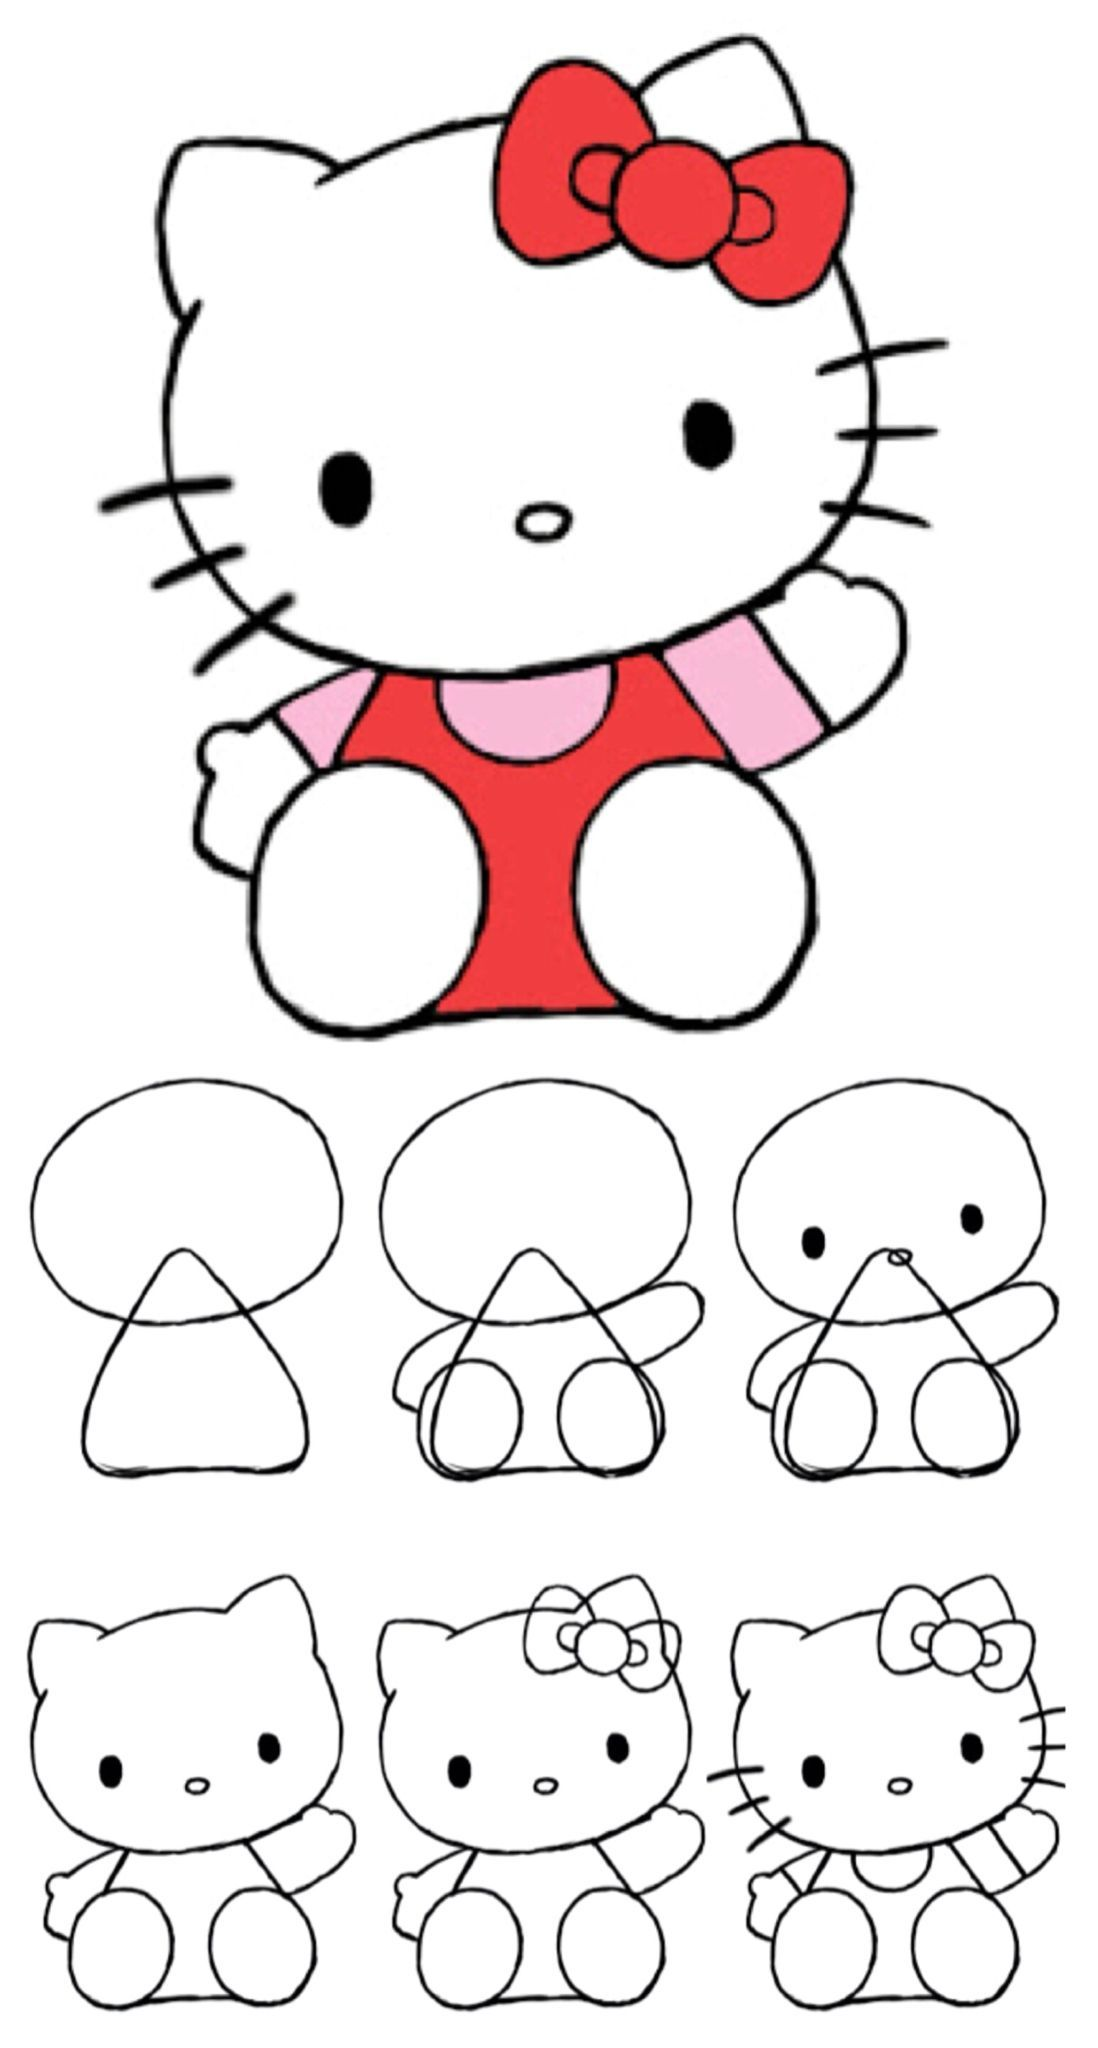 How To Draw Hello Kitty Via Draw Central Hello Kitty Drawing Kitty Drawing Art Drawings For Kids